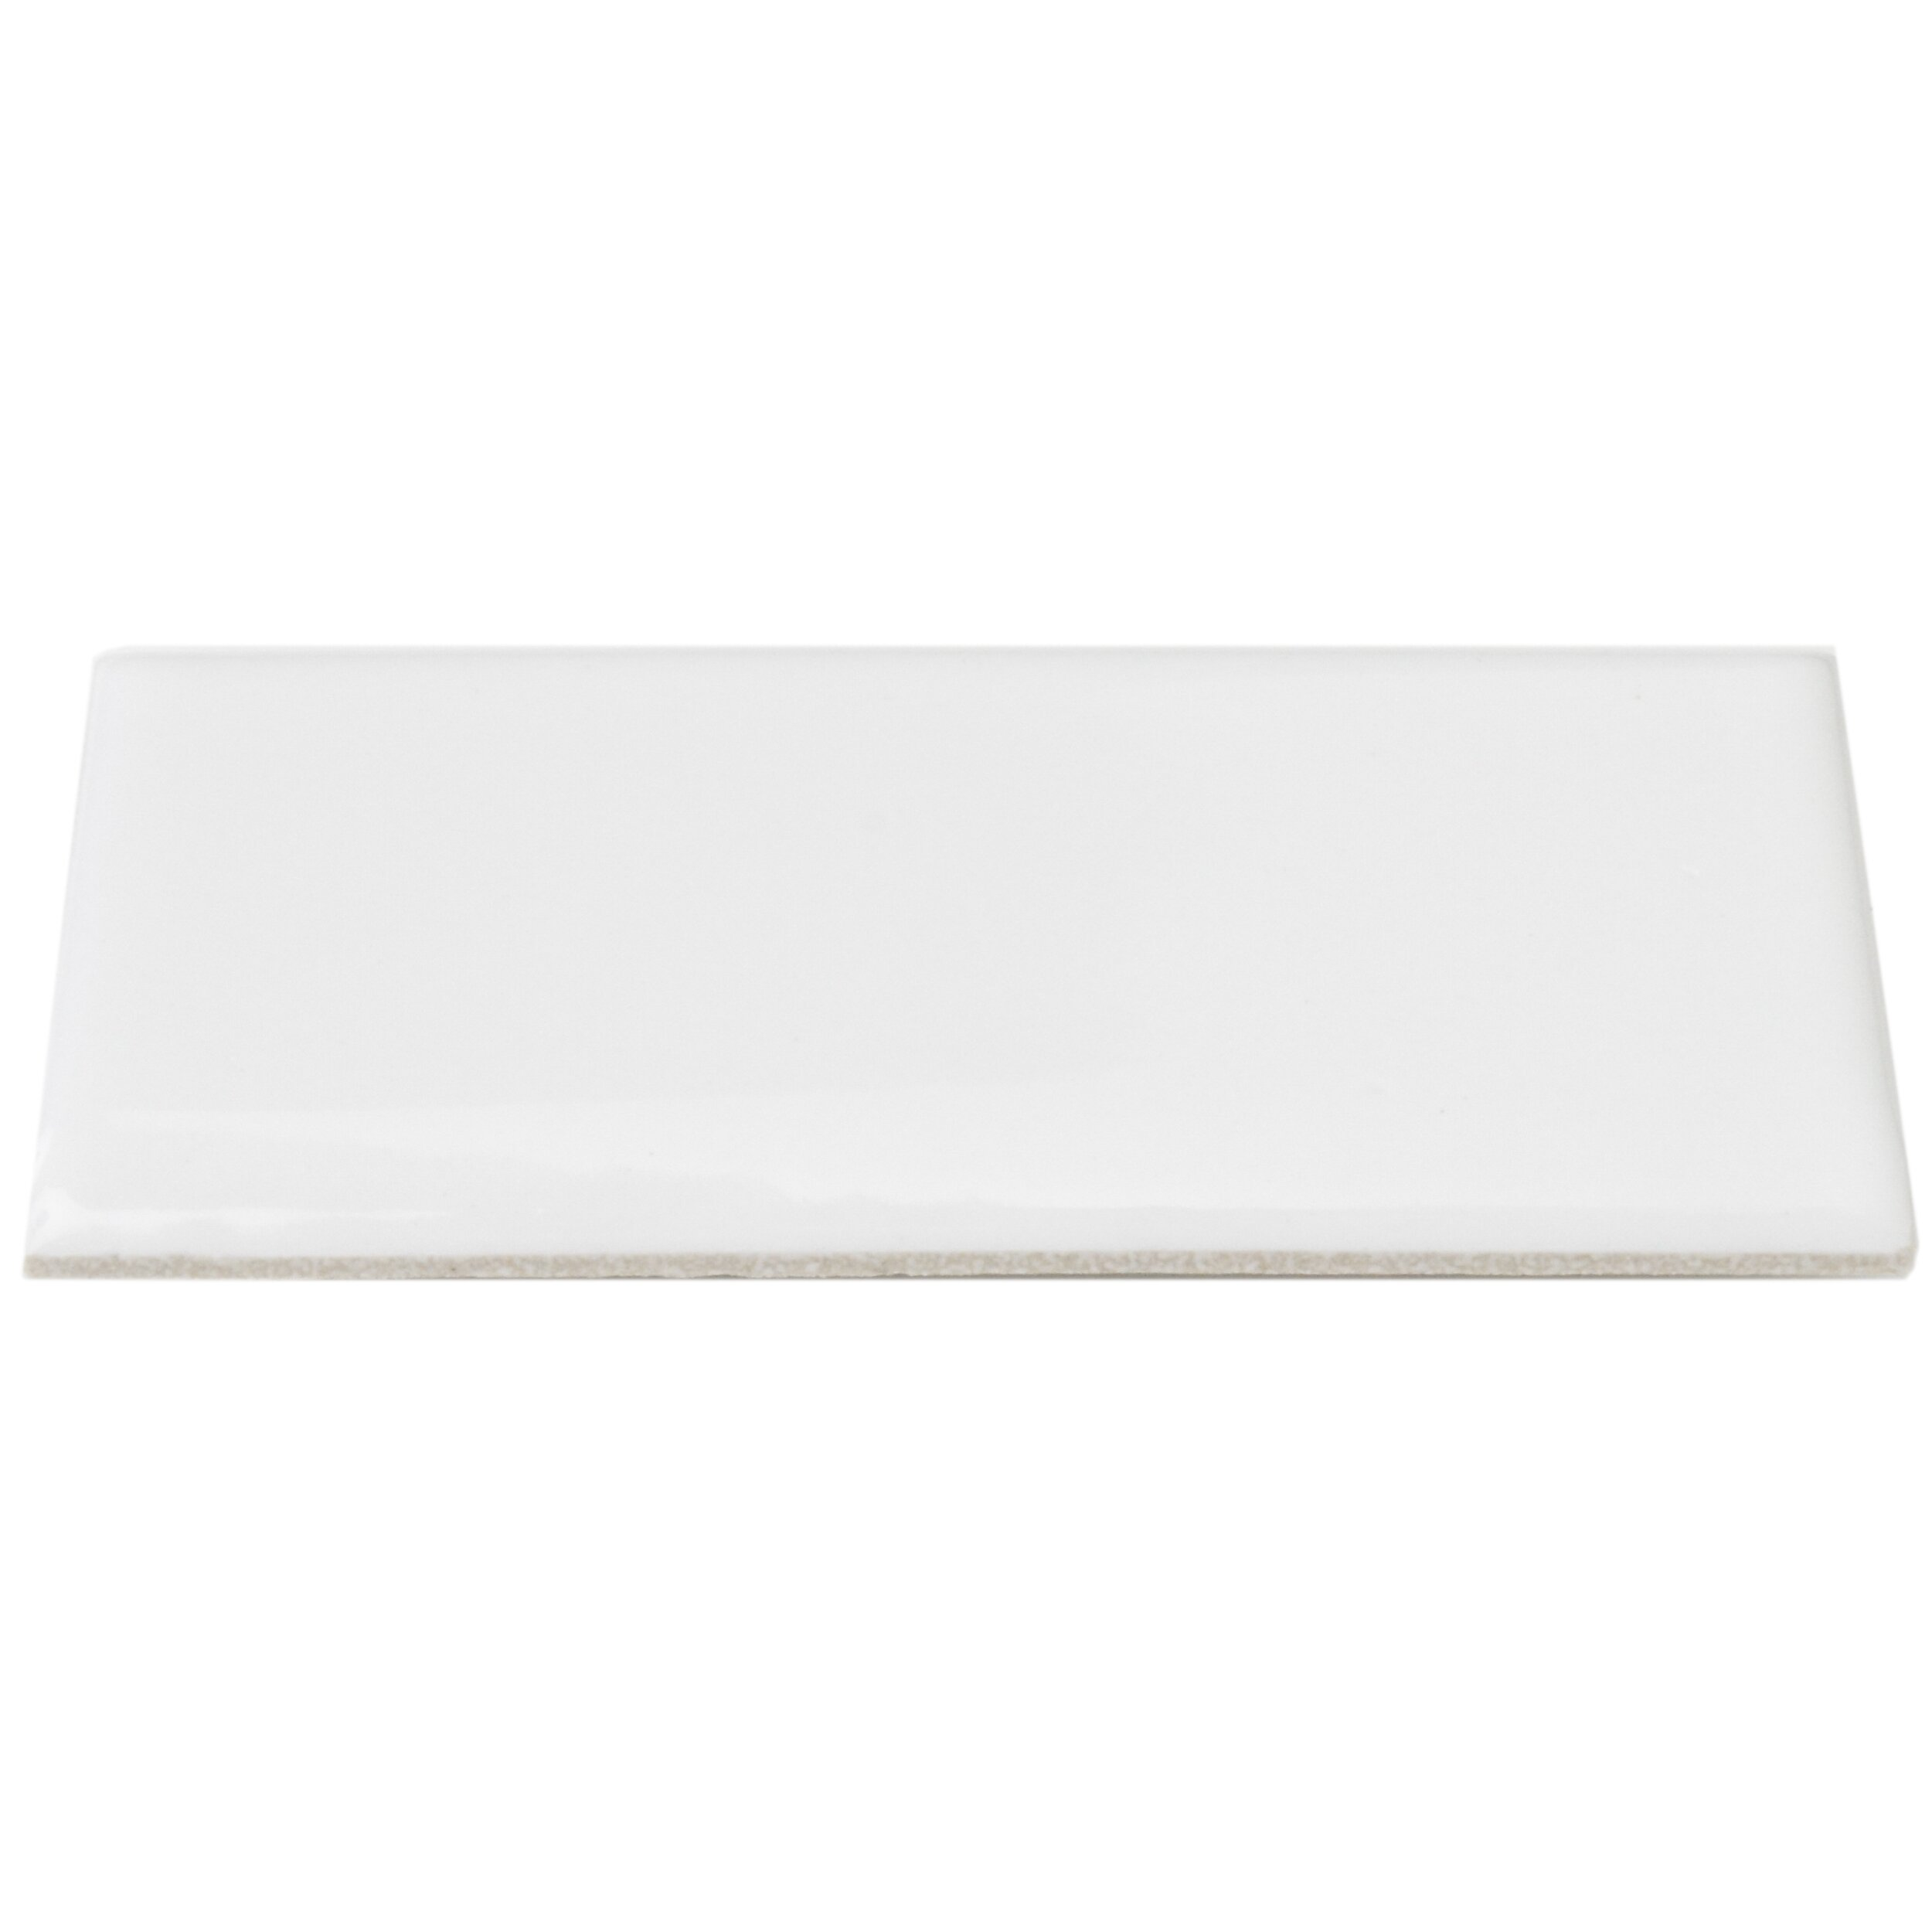 White Dining Room Set Sale Elitetile Retro 1 75 Quot X 3 75 Quot Bullnose Porcelain Tile In